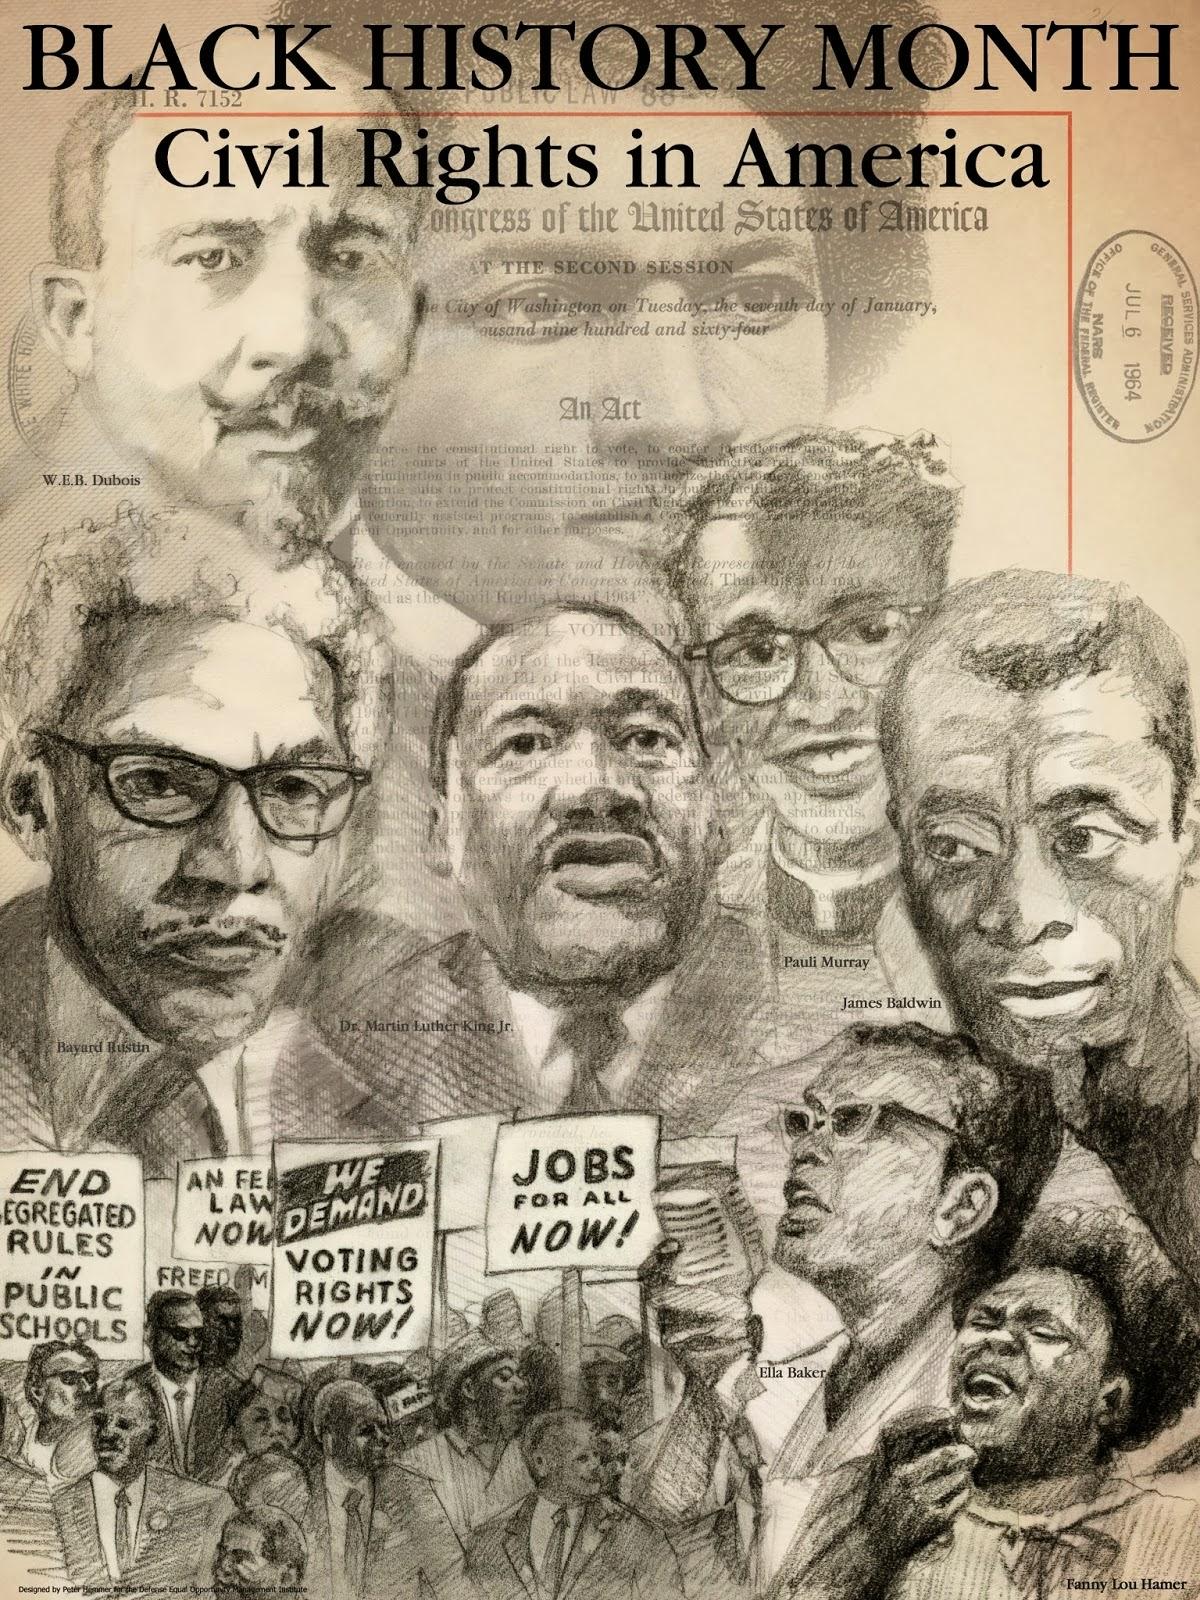 Black History In America On Pinterest: The Children's War: 2014 Black History Month